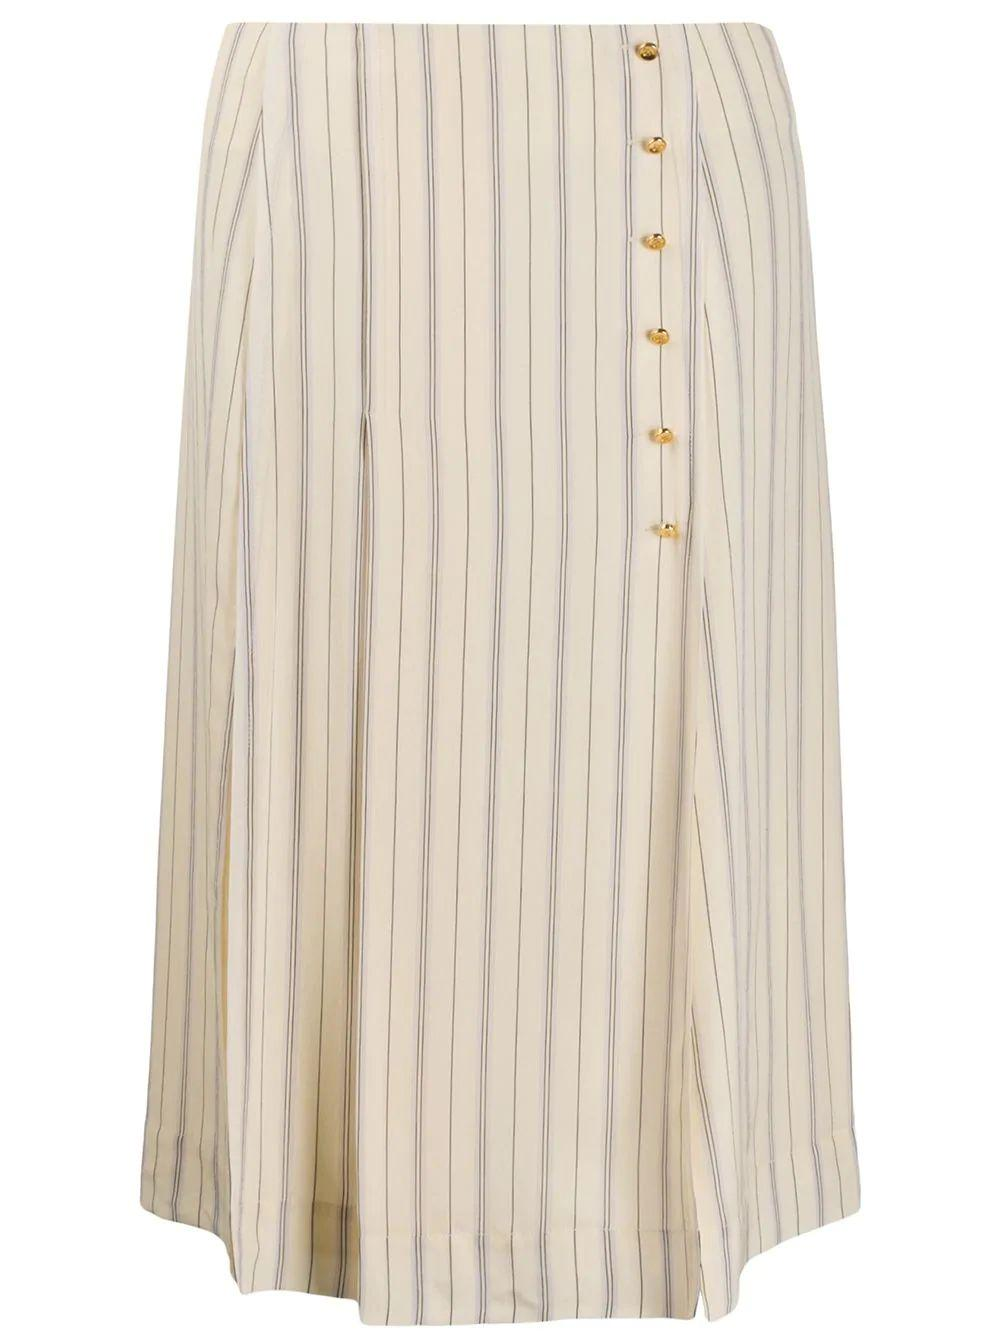 Stripe Print Crepe De Chine Skirt Item # CHC20UJU27323